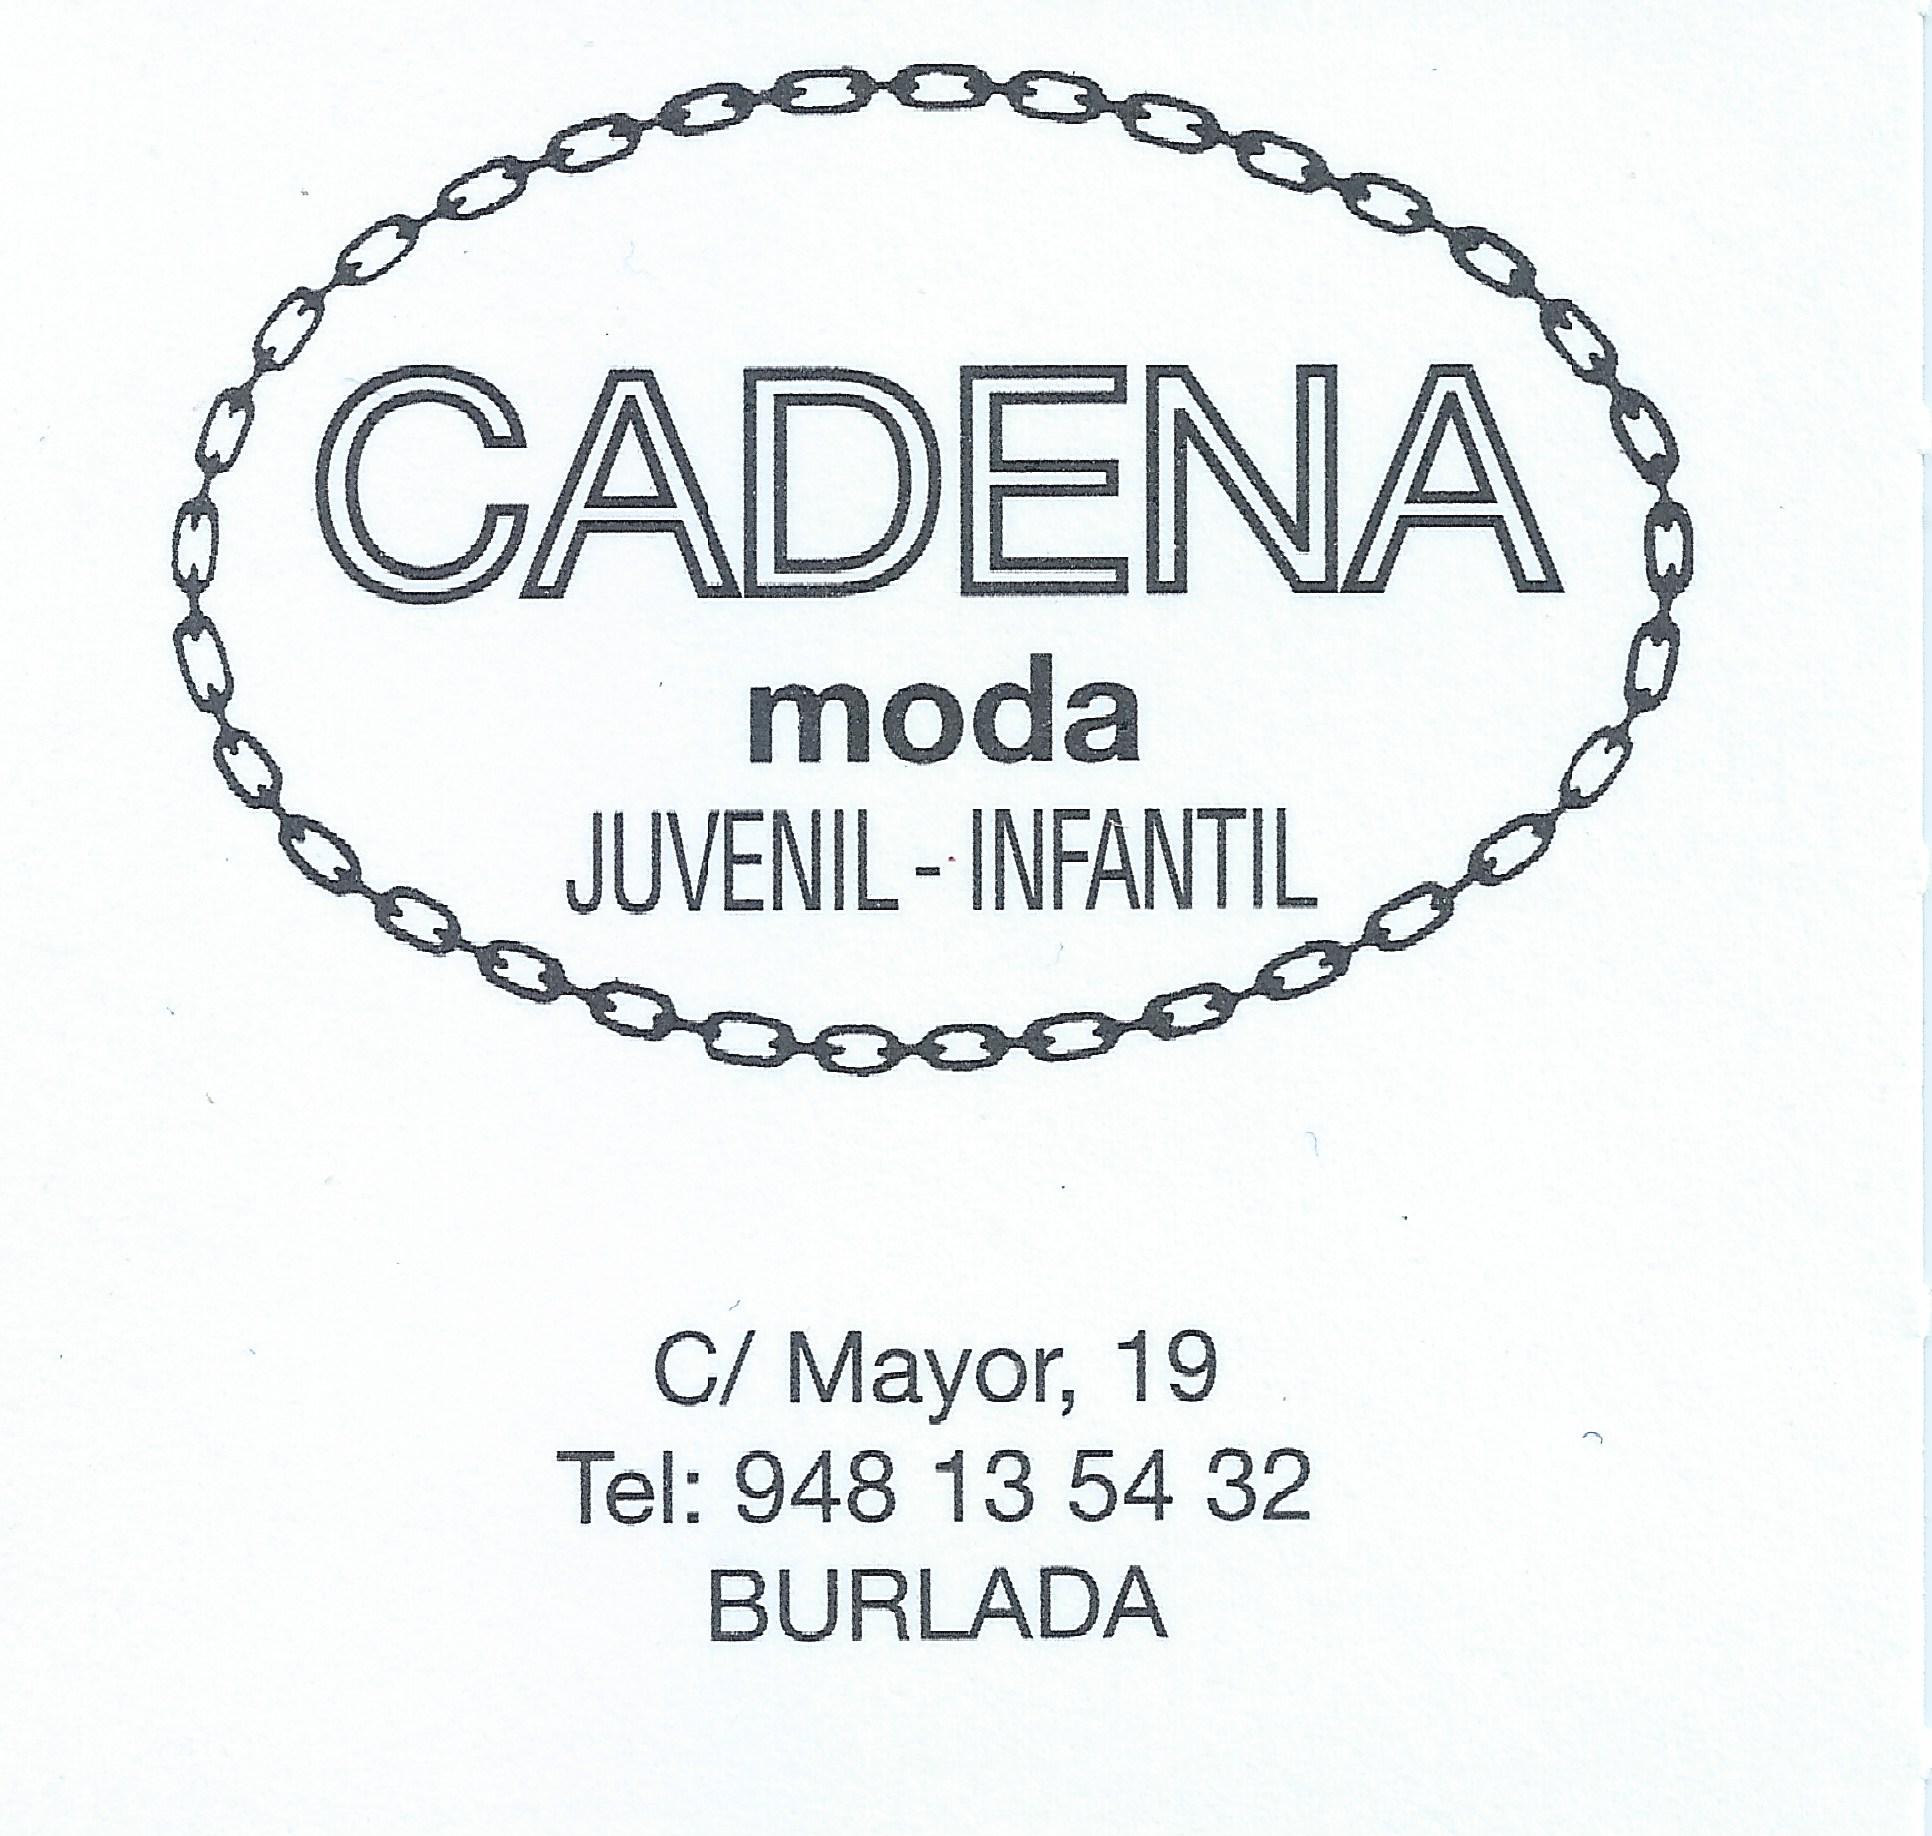 Moda Cadena